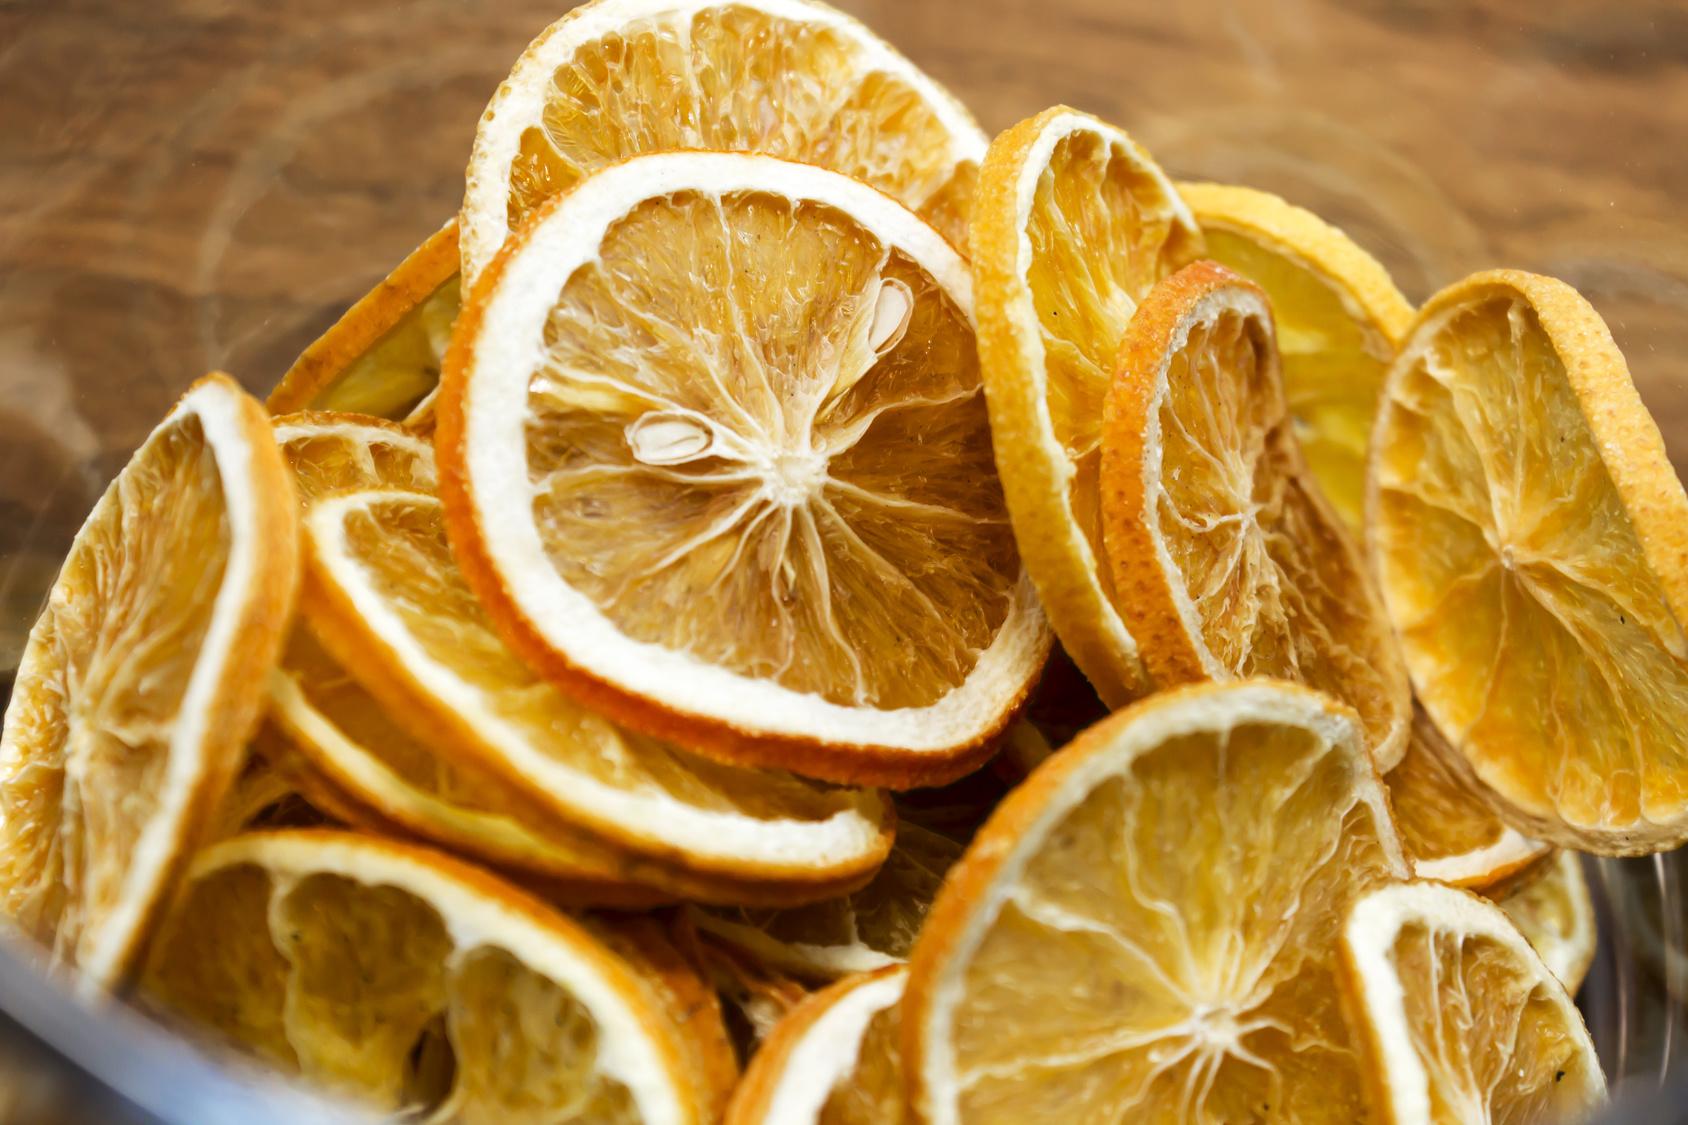 Rodajas de naranja deshidratada